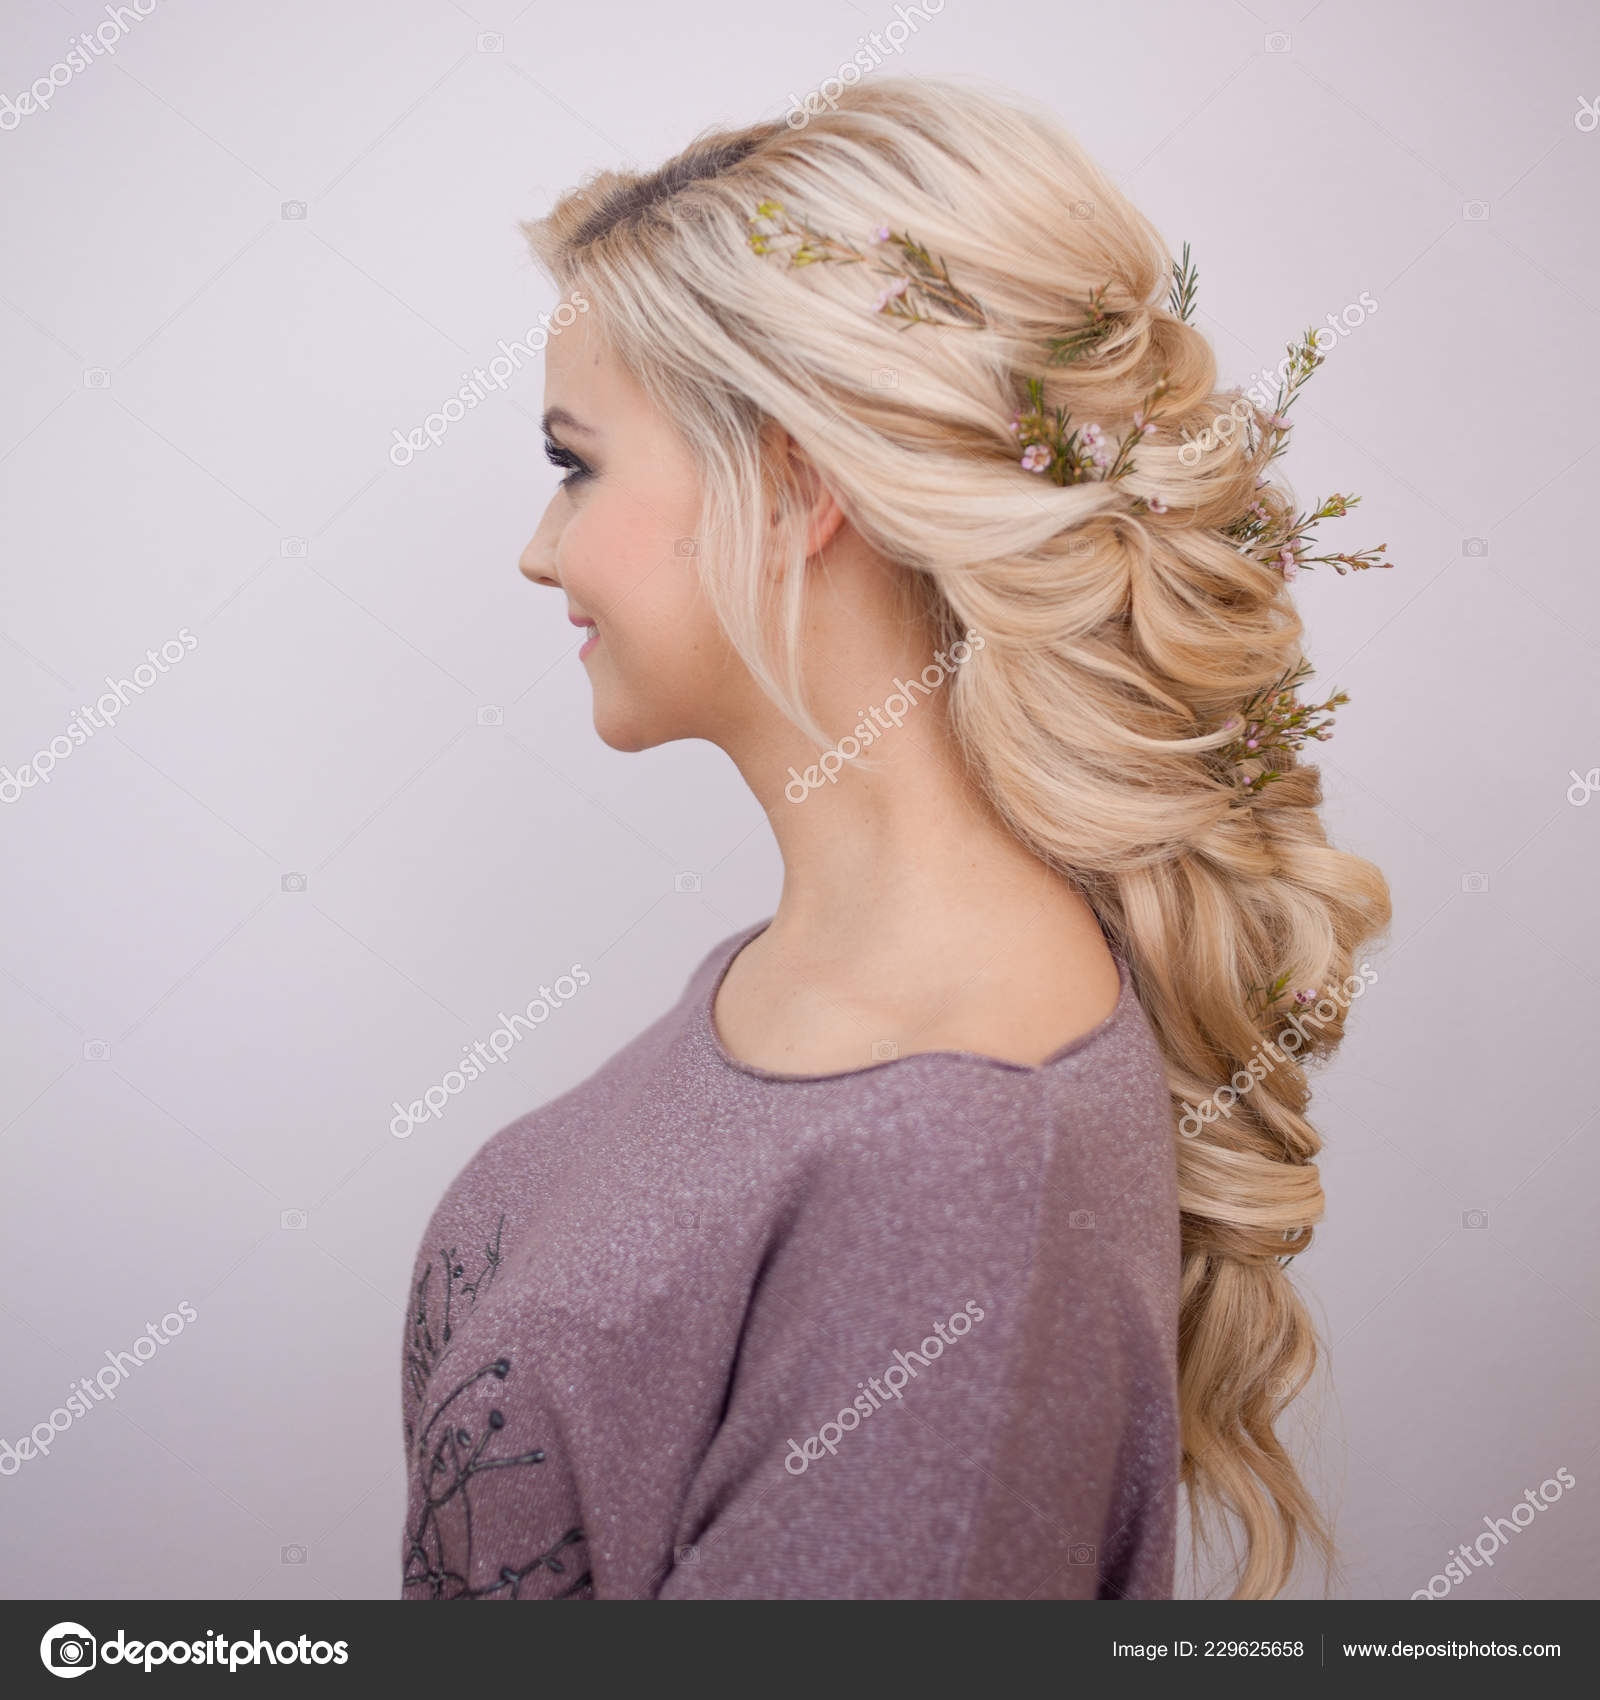 Portrat Einer Eleganten Jungen Frau Mit Blonden Haaren Trendige